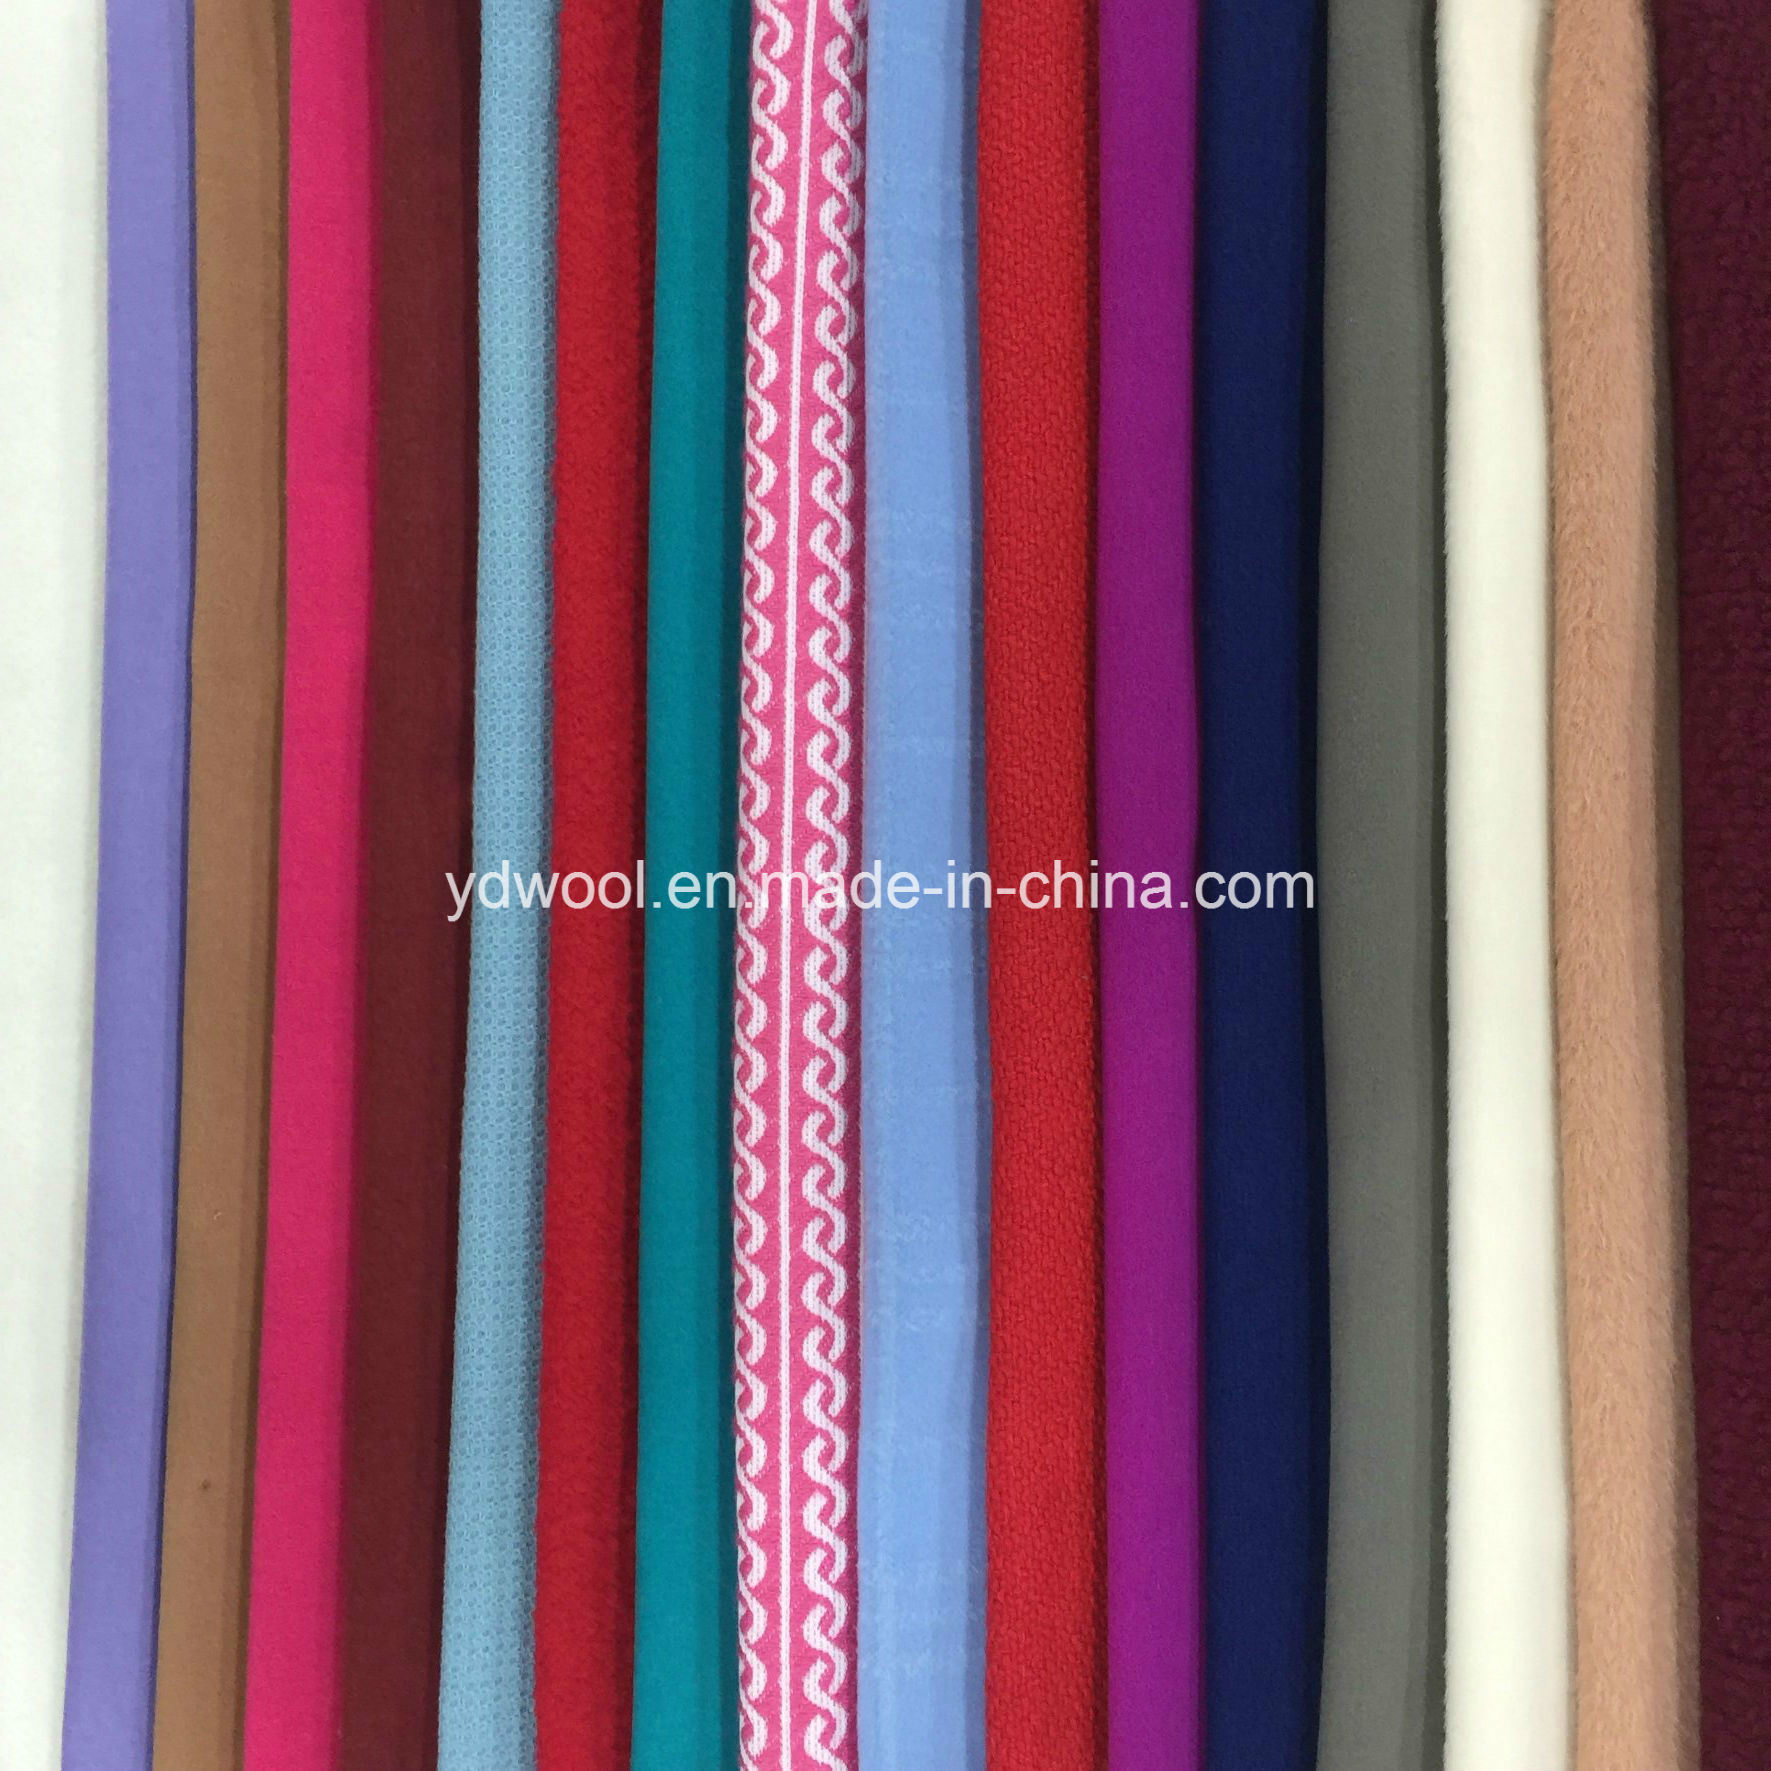 Wool/ Knitting /Semi-Worsted Ready Greige Fabric